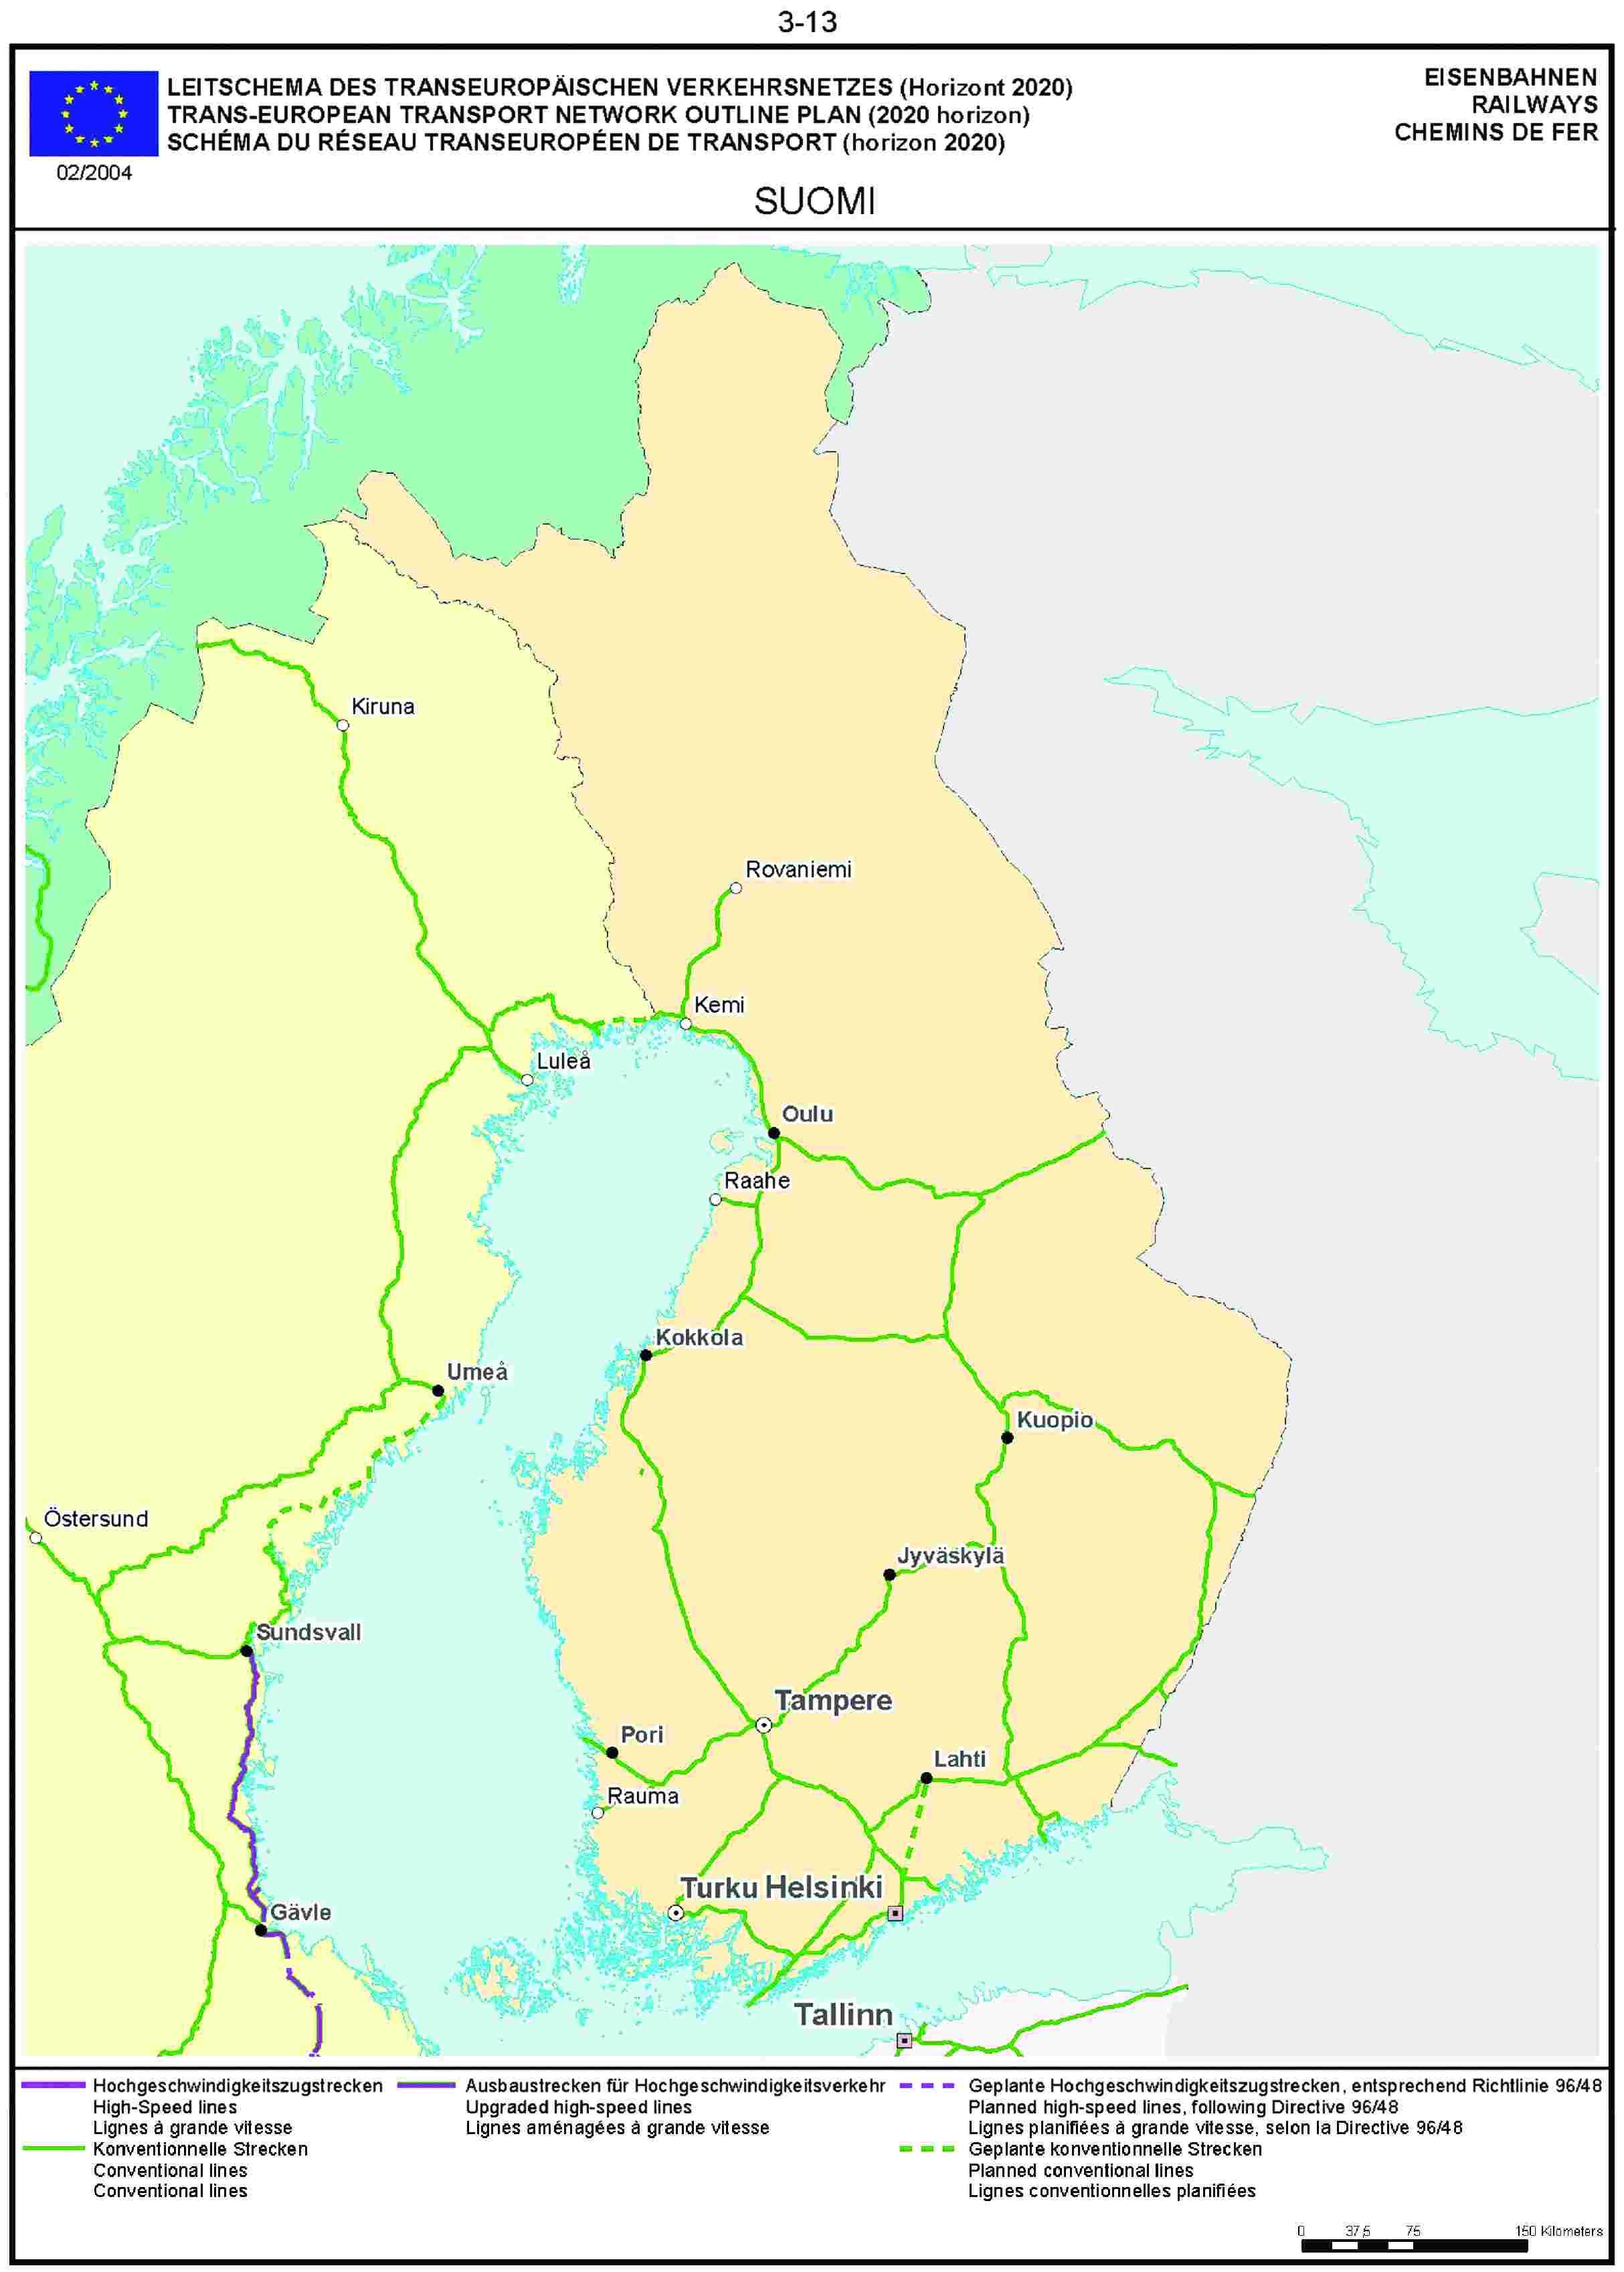 3.13LEITSCHEMA DES TRANSEUROPÄISCHEN VERKEHRSNETZES (Horizont 2020) EISENBAHNENTRANS-EUROPEAN TRANSPORT NETWORK OUTLINE PLAN (2020 horizon) RAILWAYSSCHÉMA DU RÉSEAU TRANSEUROPÉEN DE TRANSPORT (horizon 2020) CHEMINS DE FER02/2004SUOMI